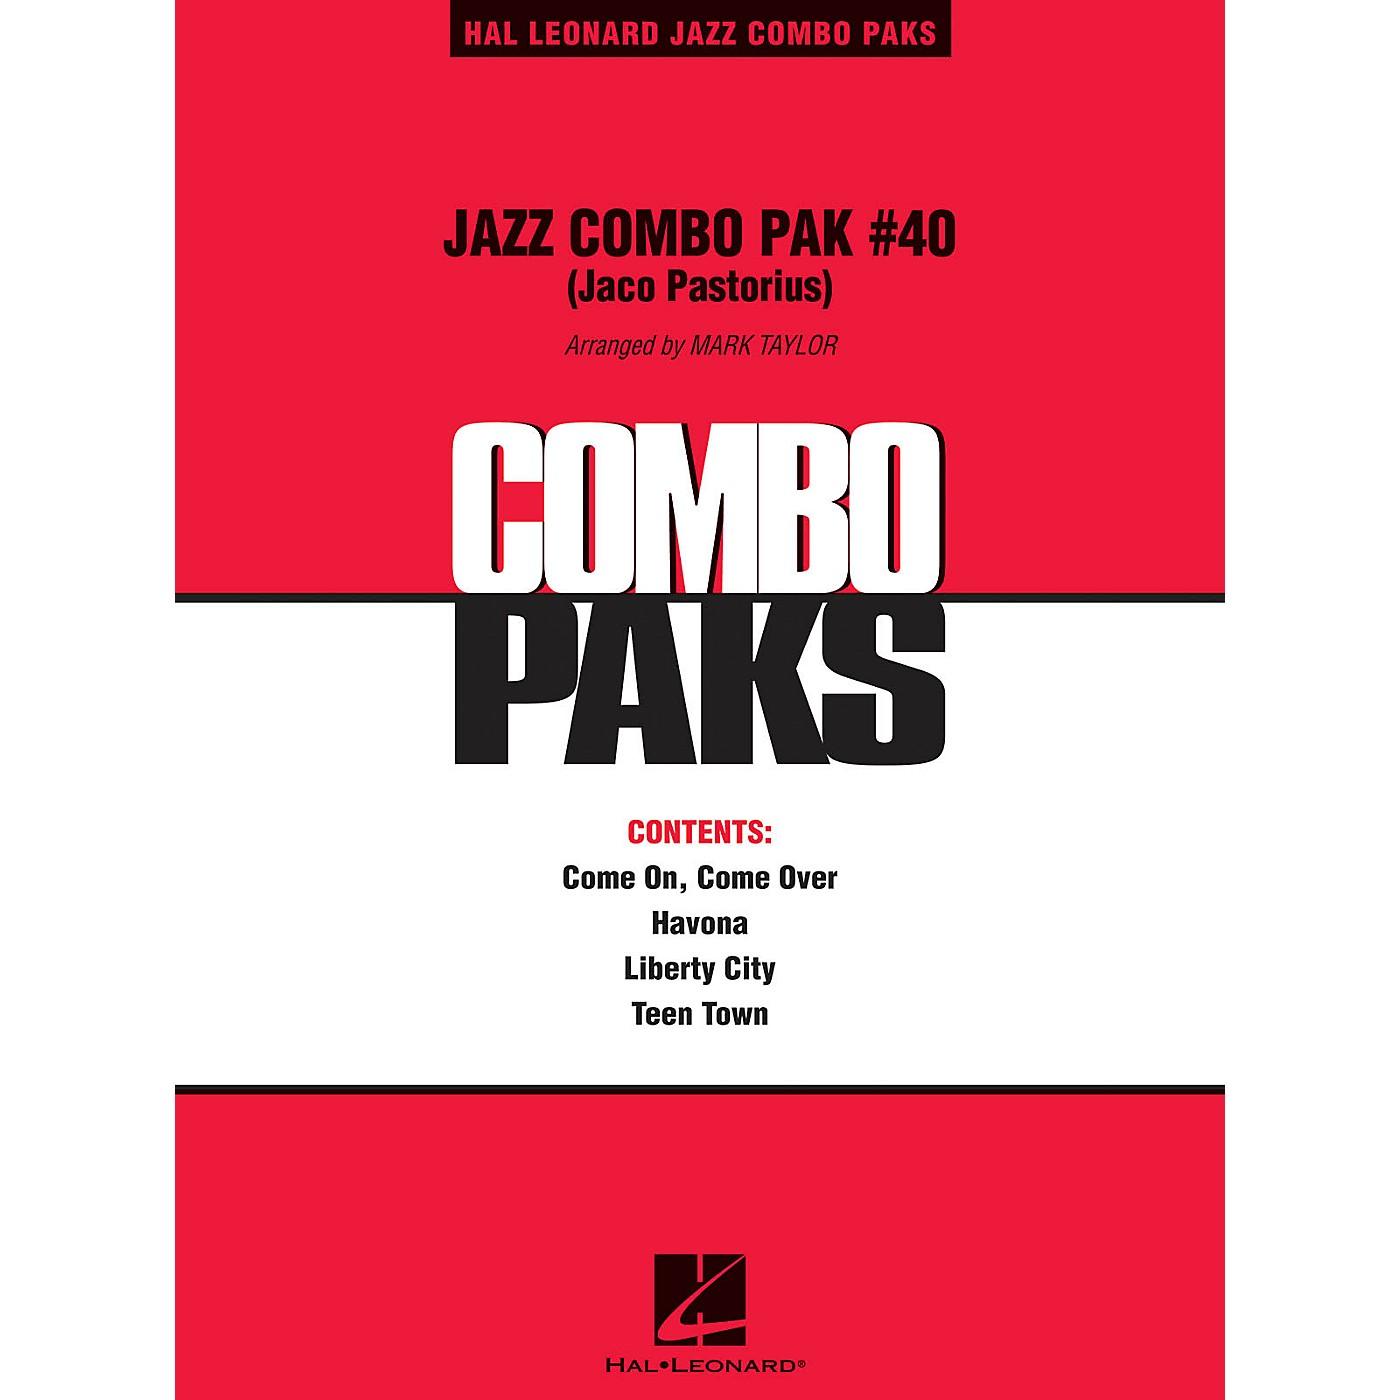 Hal Leonard Jazz Combo Pak #40 (Jaco Pastorius) Jazz Band Level 3 by Jaco Pastorius Arranged by Mark Taylor thumbnail